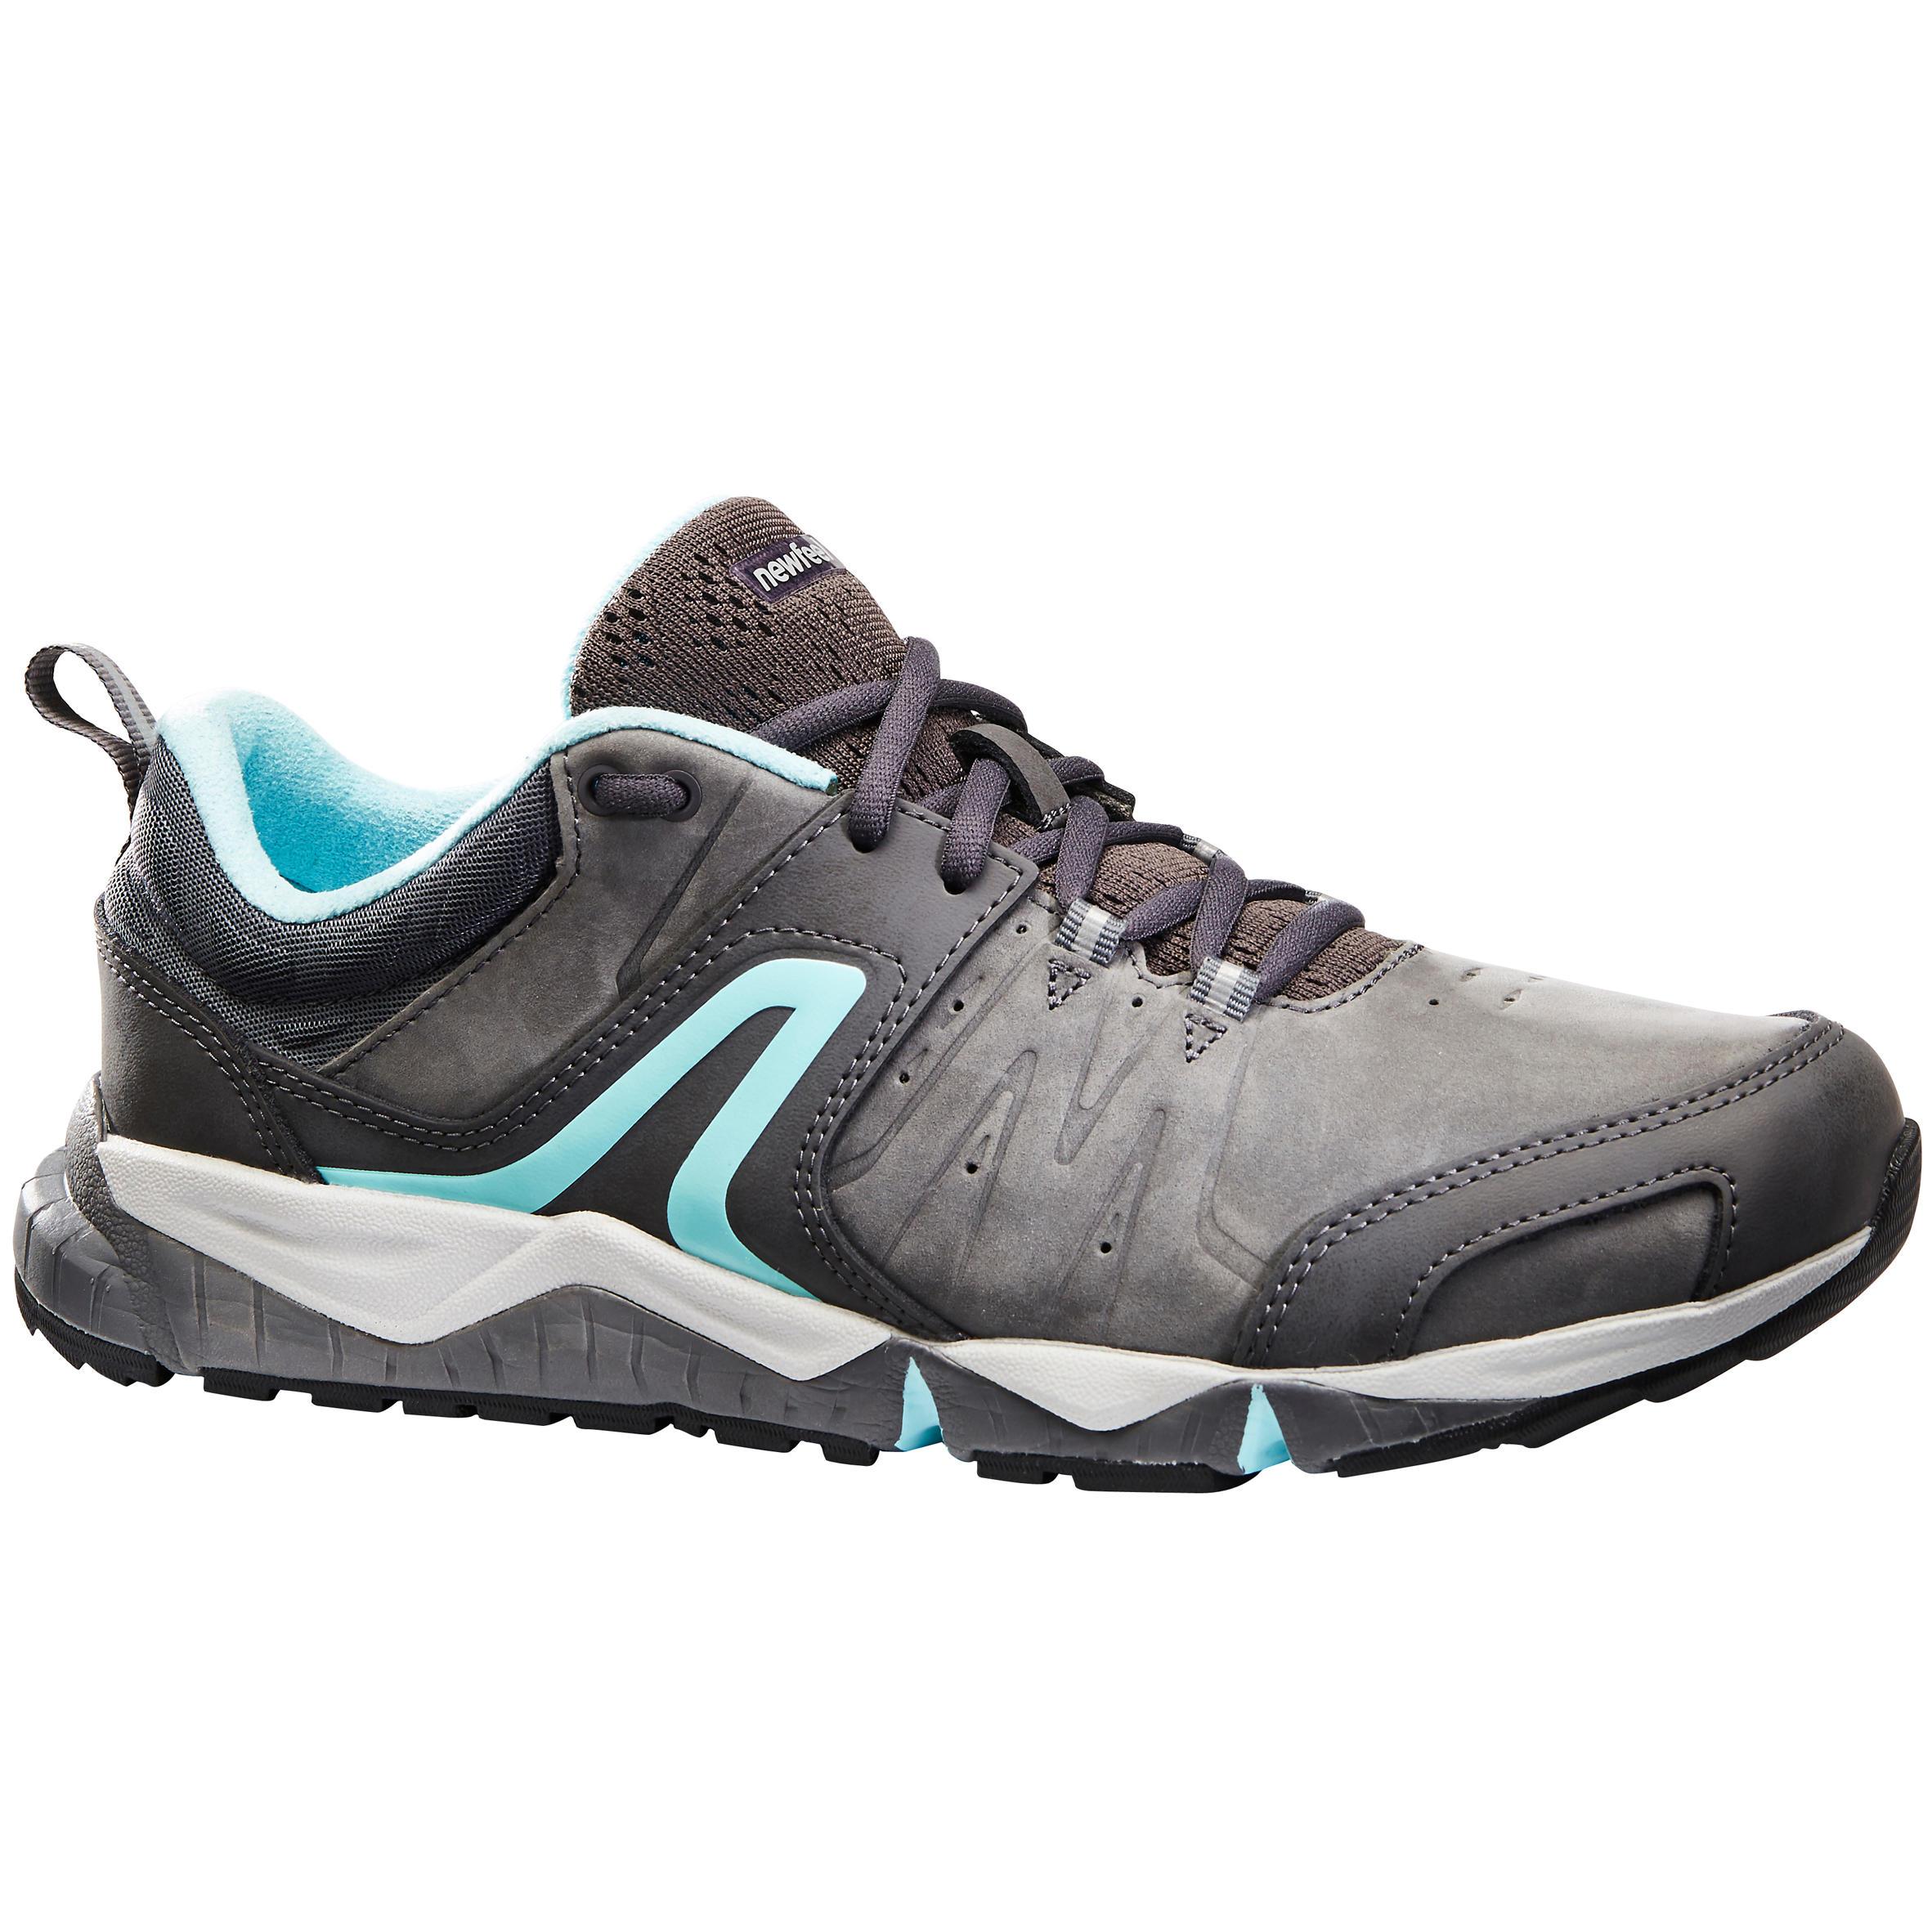 Newfeel Chaussures marche sportive femme PW 940 Propulse Motion cuir gris / bleu - Newfeel